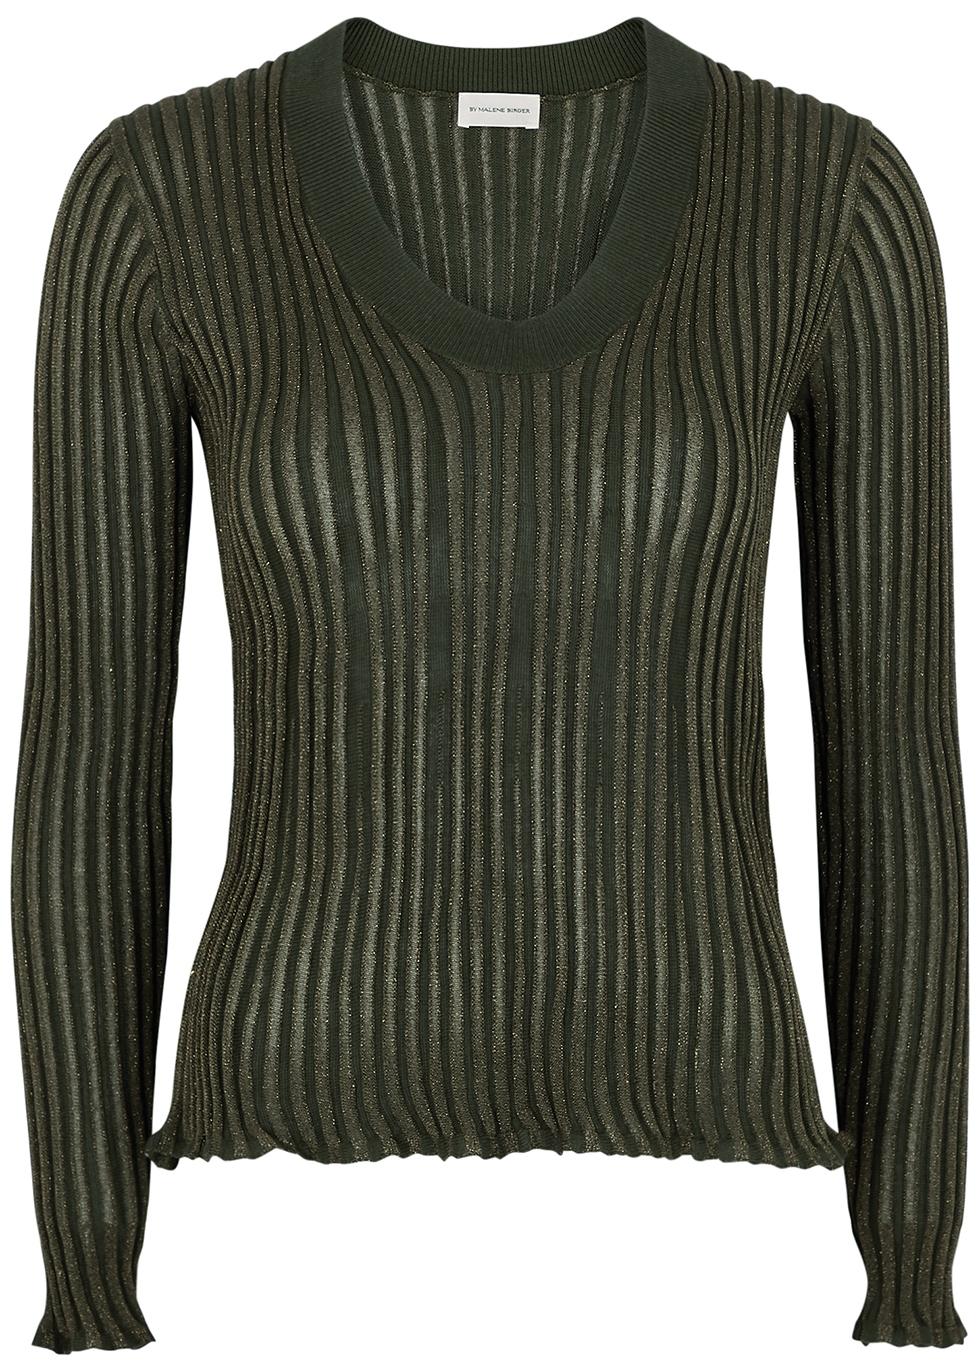 Bhesa army green ribbed metallic-weave jumper